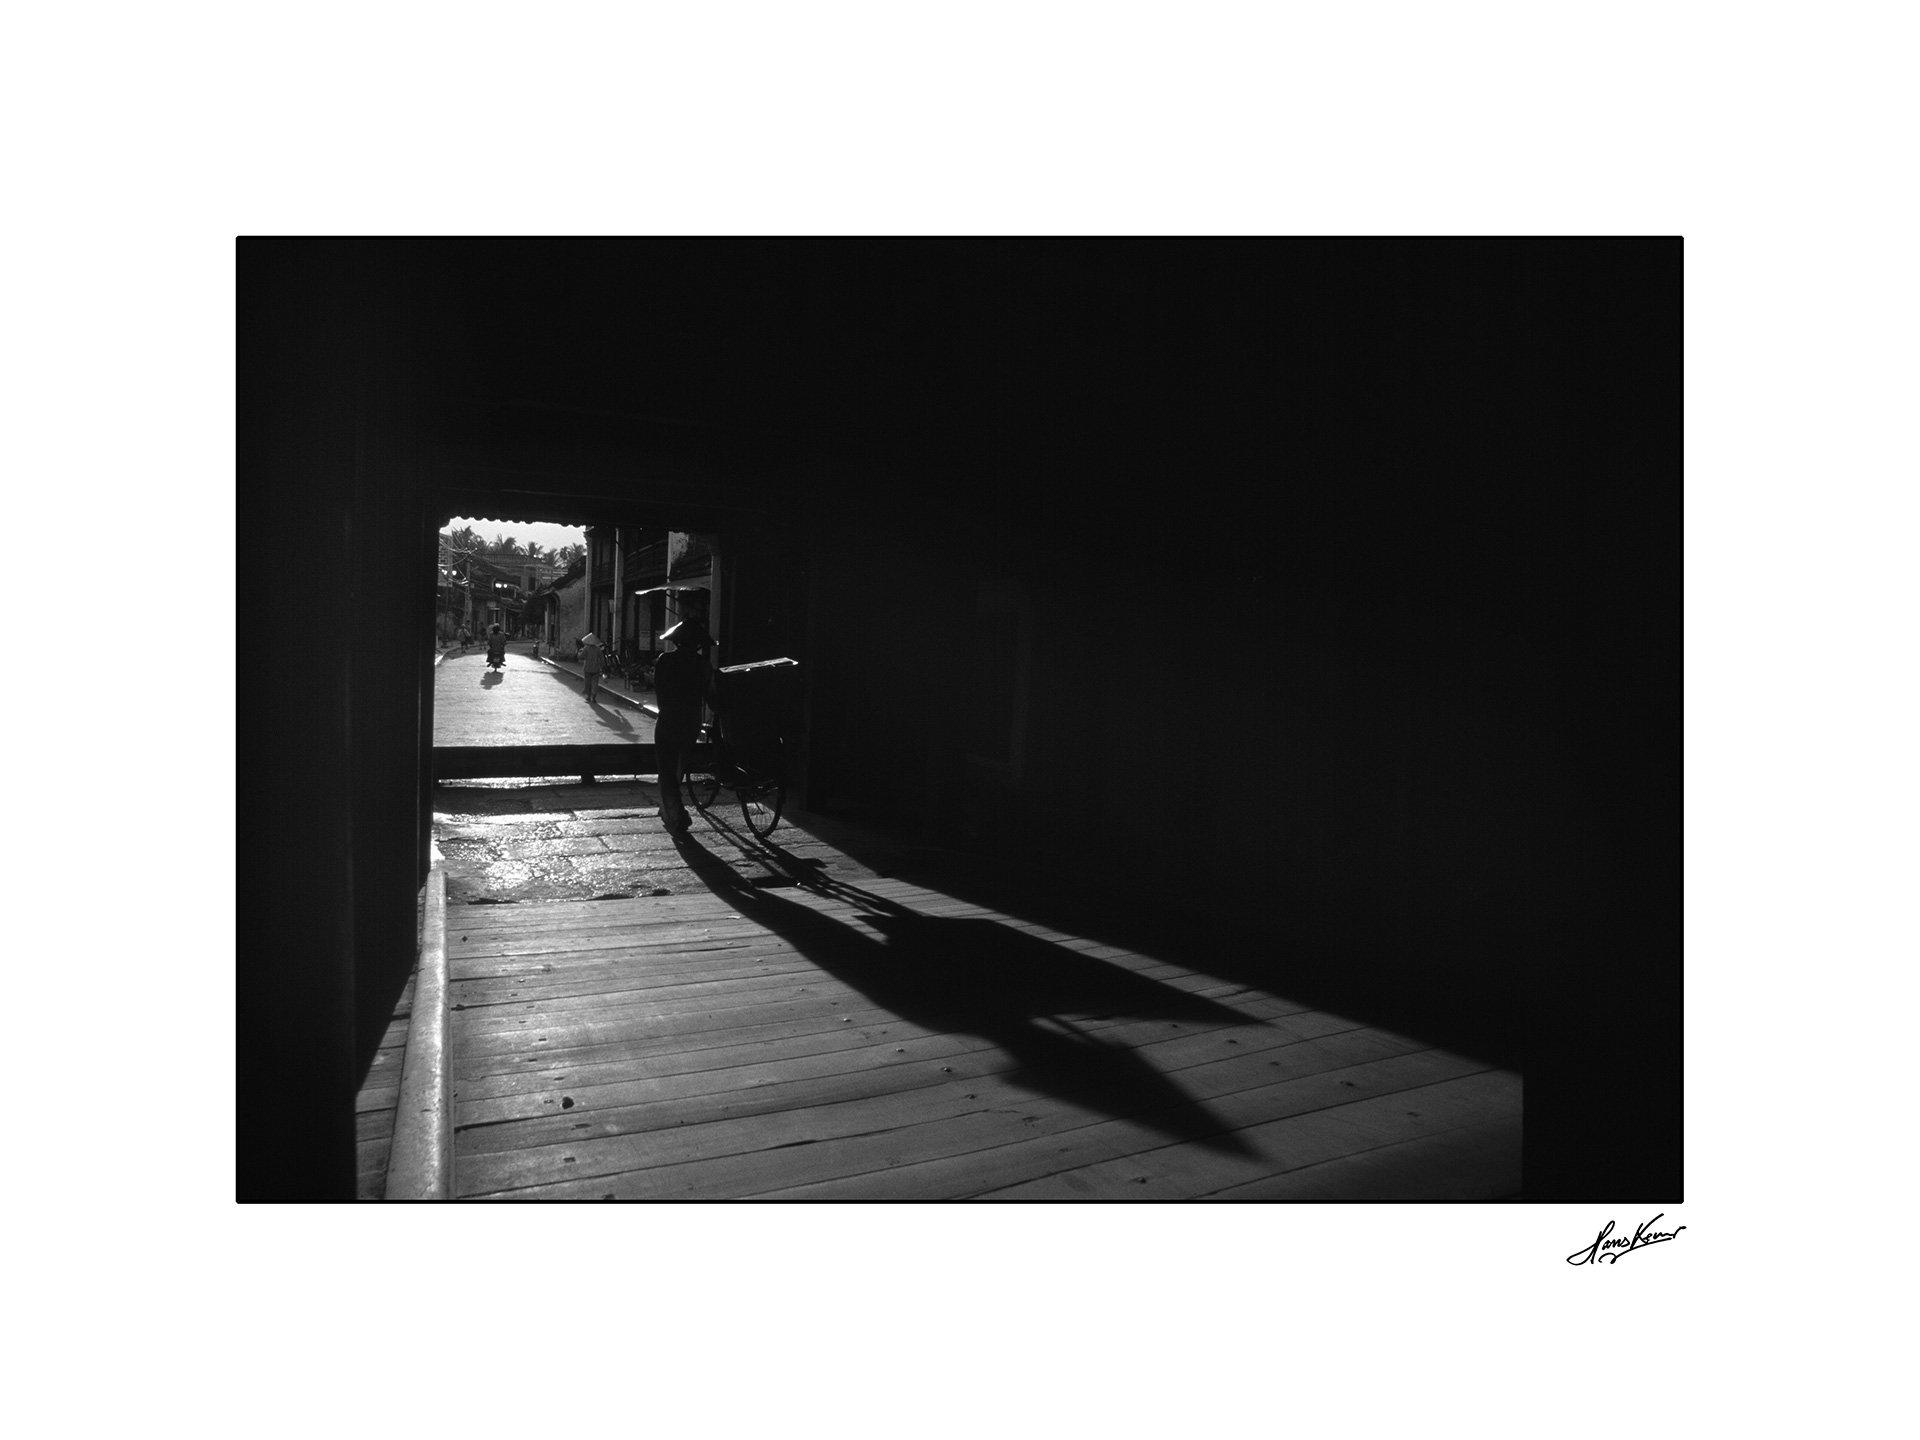 Shadow, Japanese Bridge, Hoi An, Vietnam, 1999